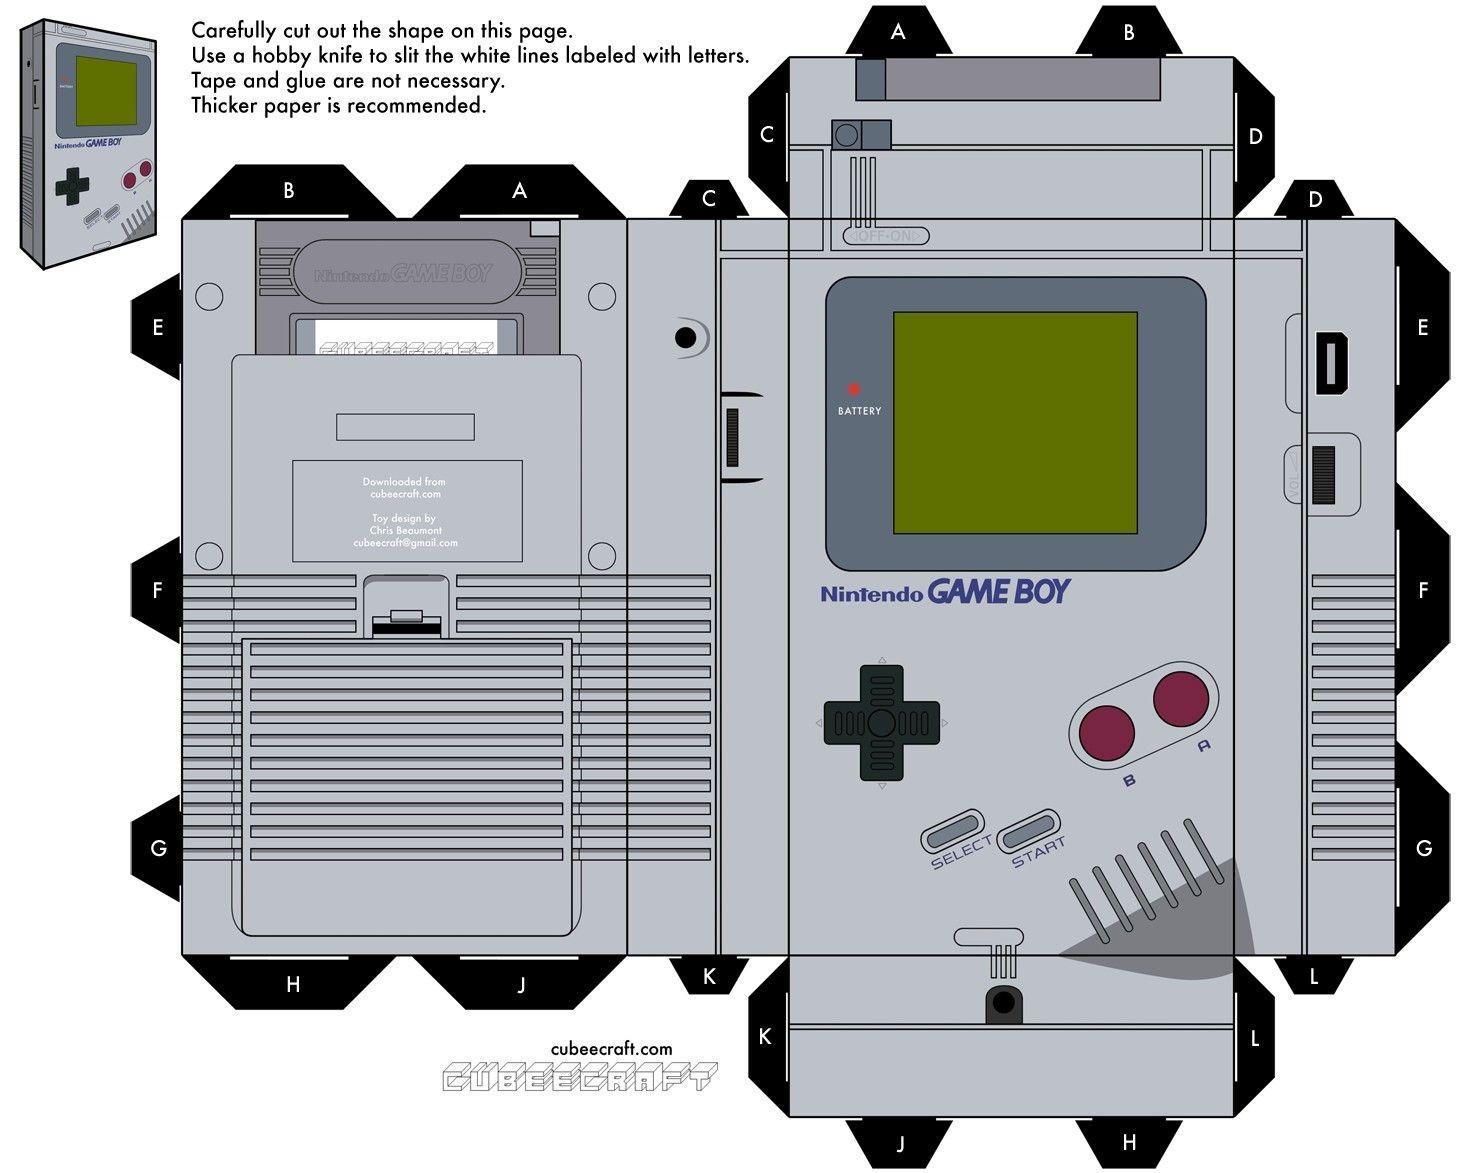 Papercraft Mario Kart Imprimibles Papercraft Super Mario Bros El Invernadero Creativo